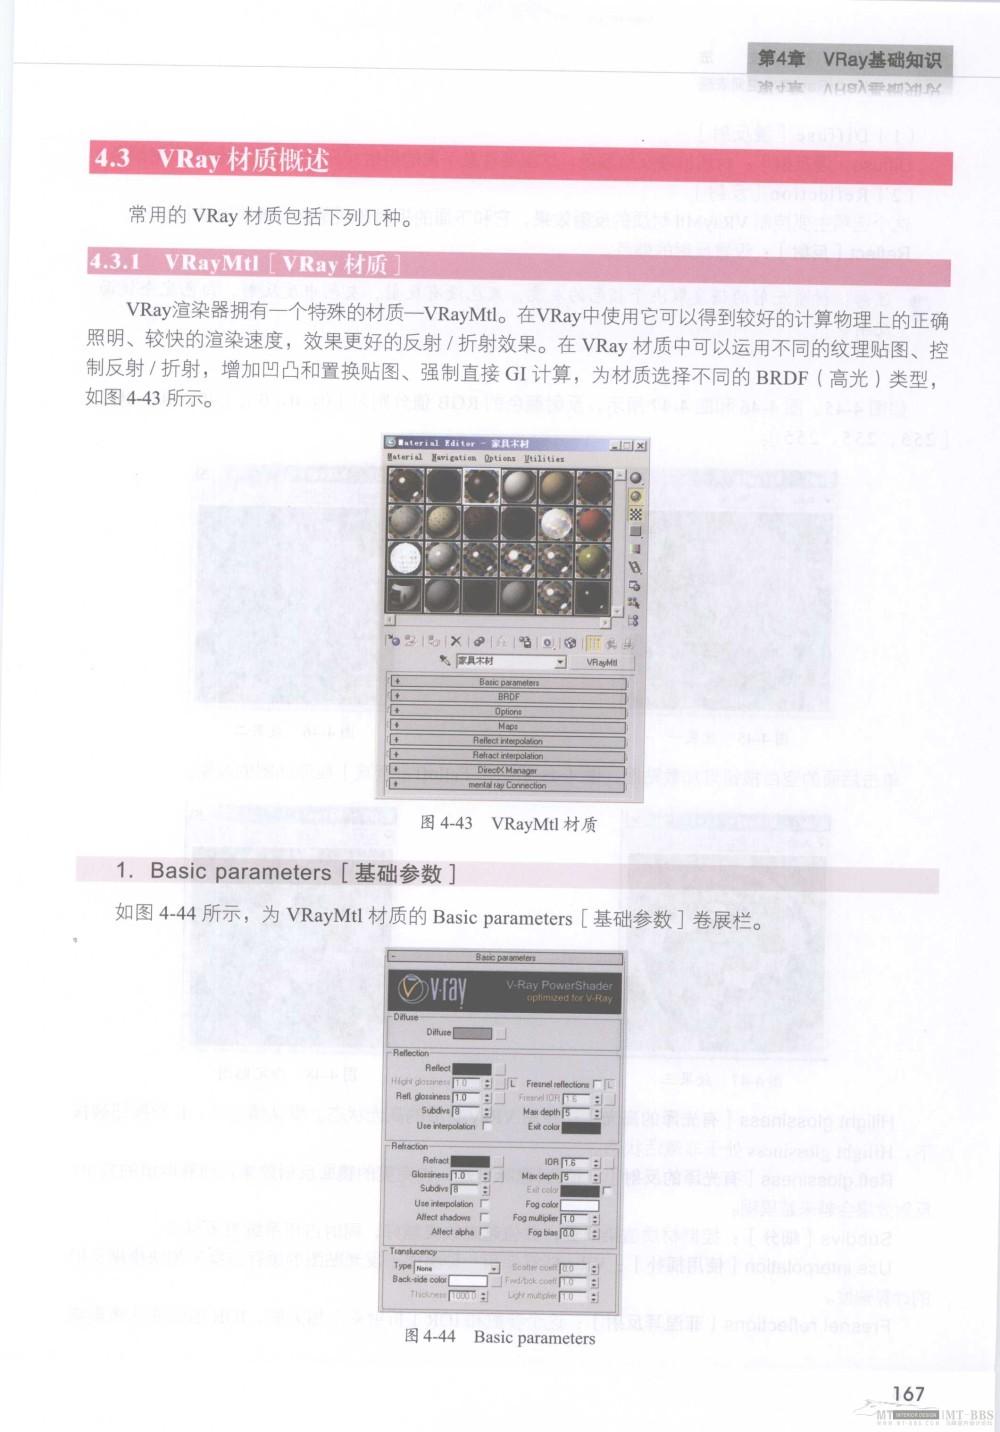 水晶石技法-3ds_Max&VRay室内空间表现_水晶石技法-3ds_Max&VRay室内空间表现_页面_173.jpg